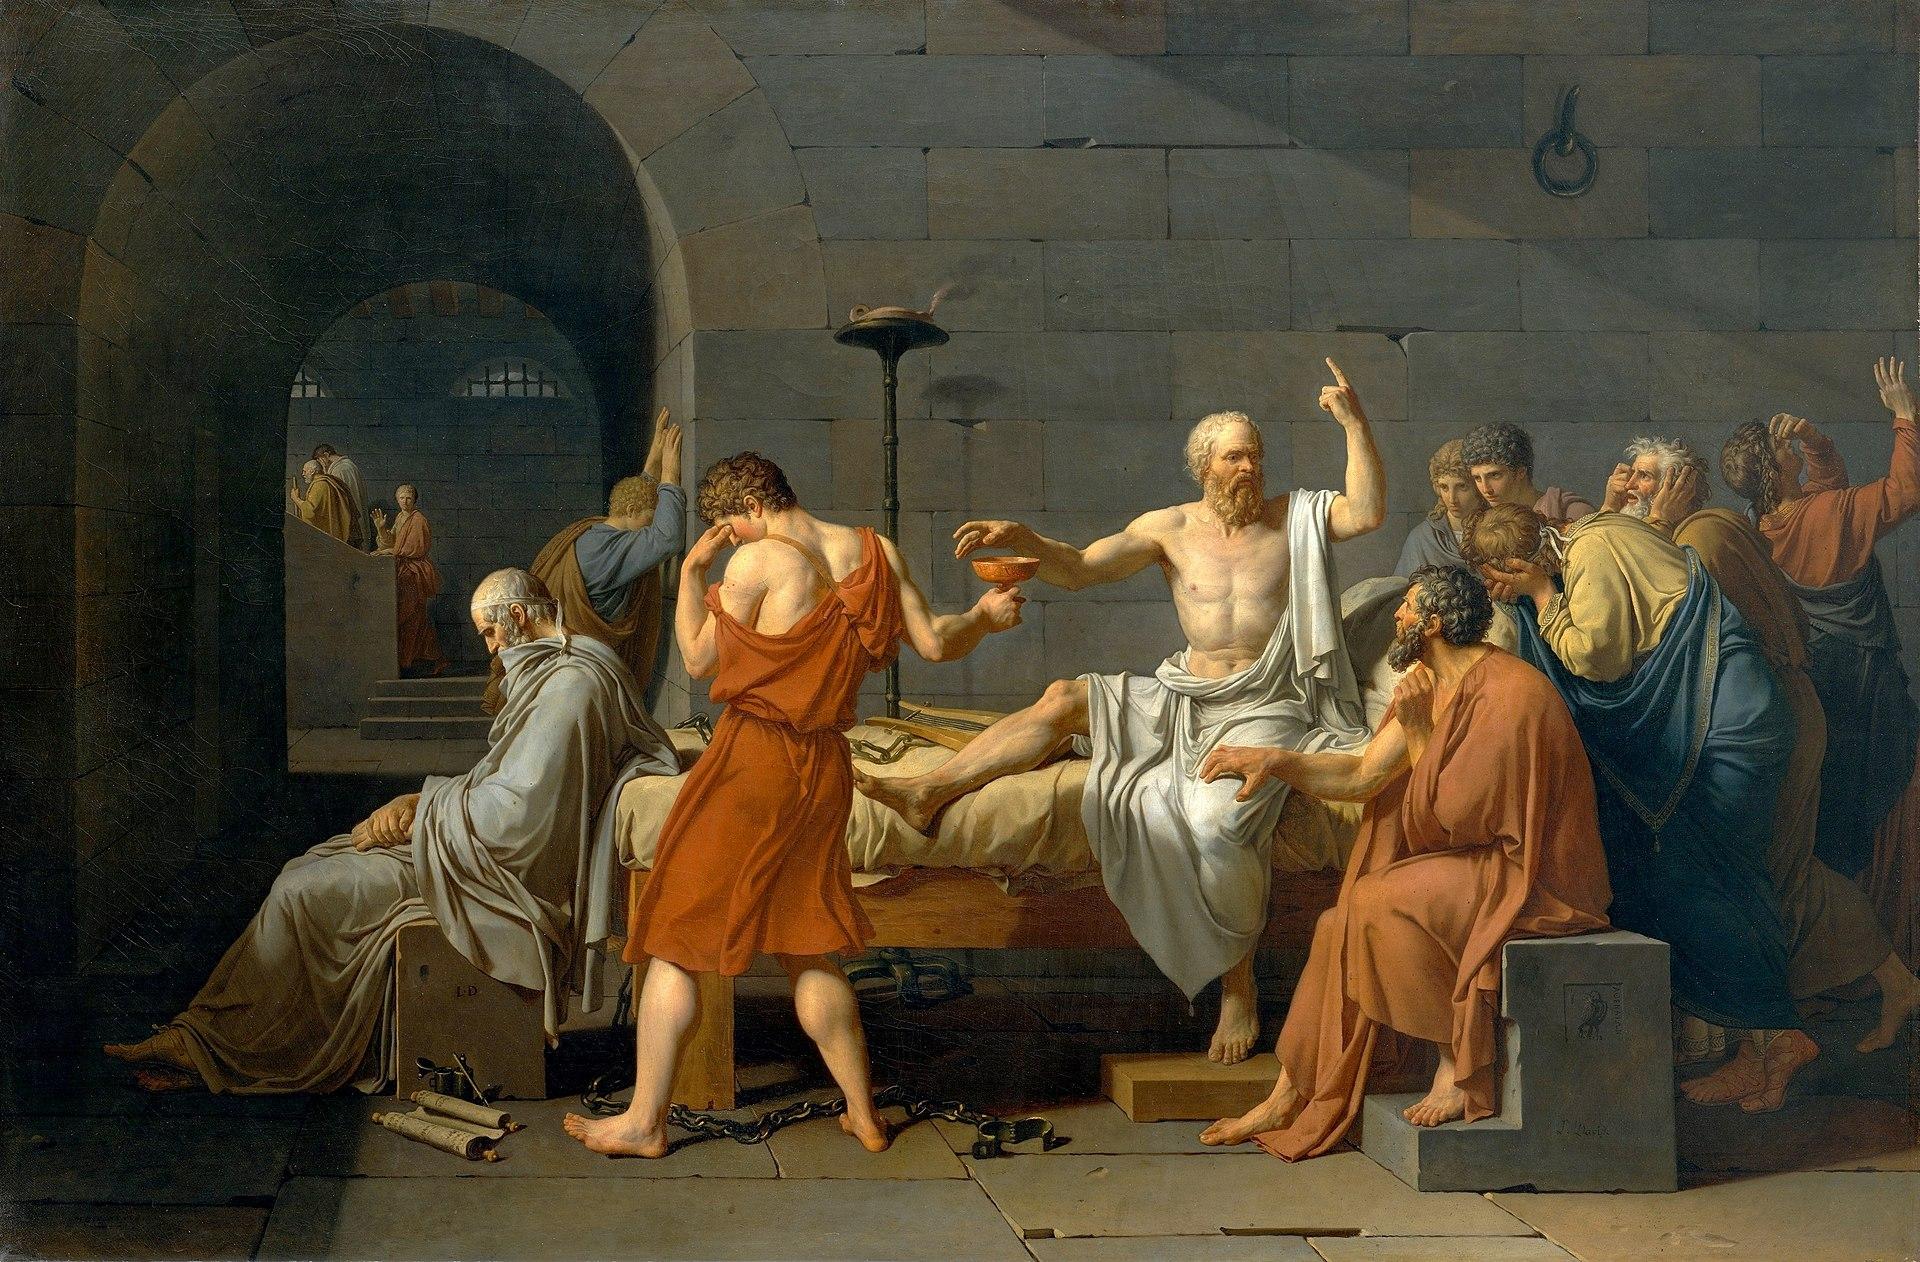 the similarities between greek philosophers socrates plato and aristotle